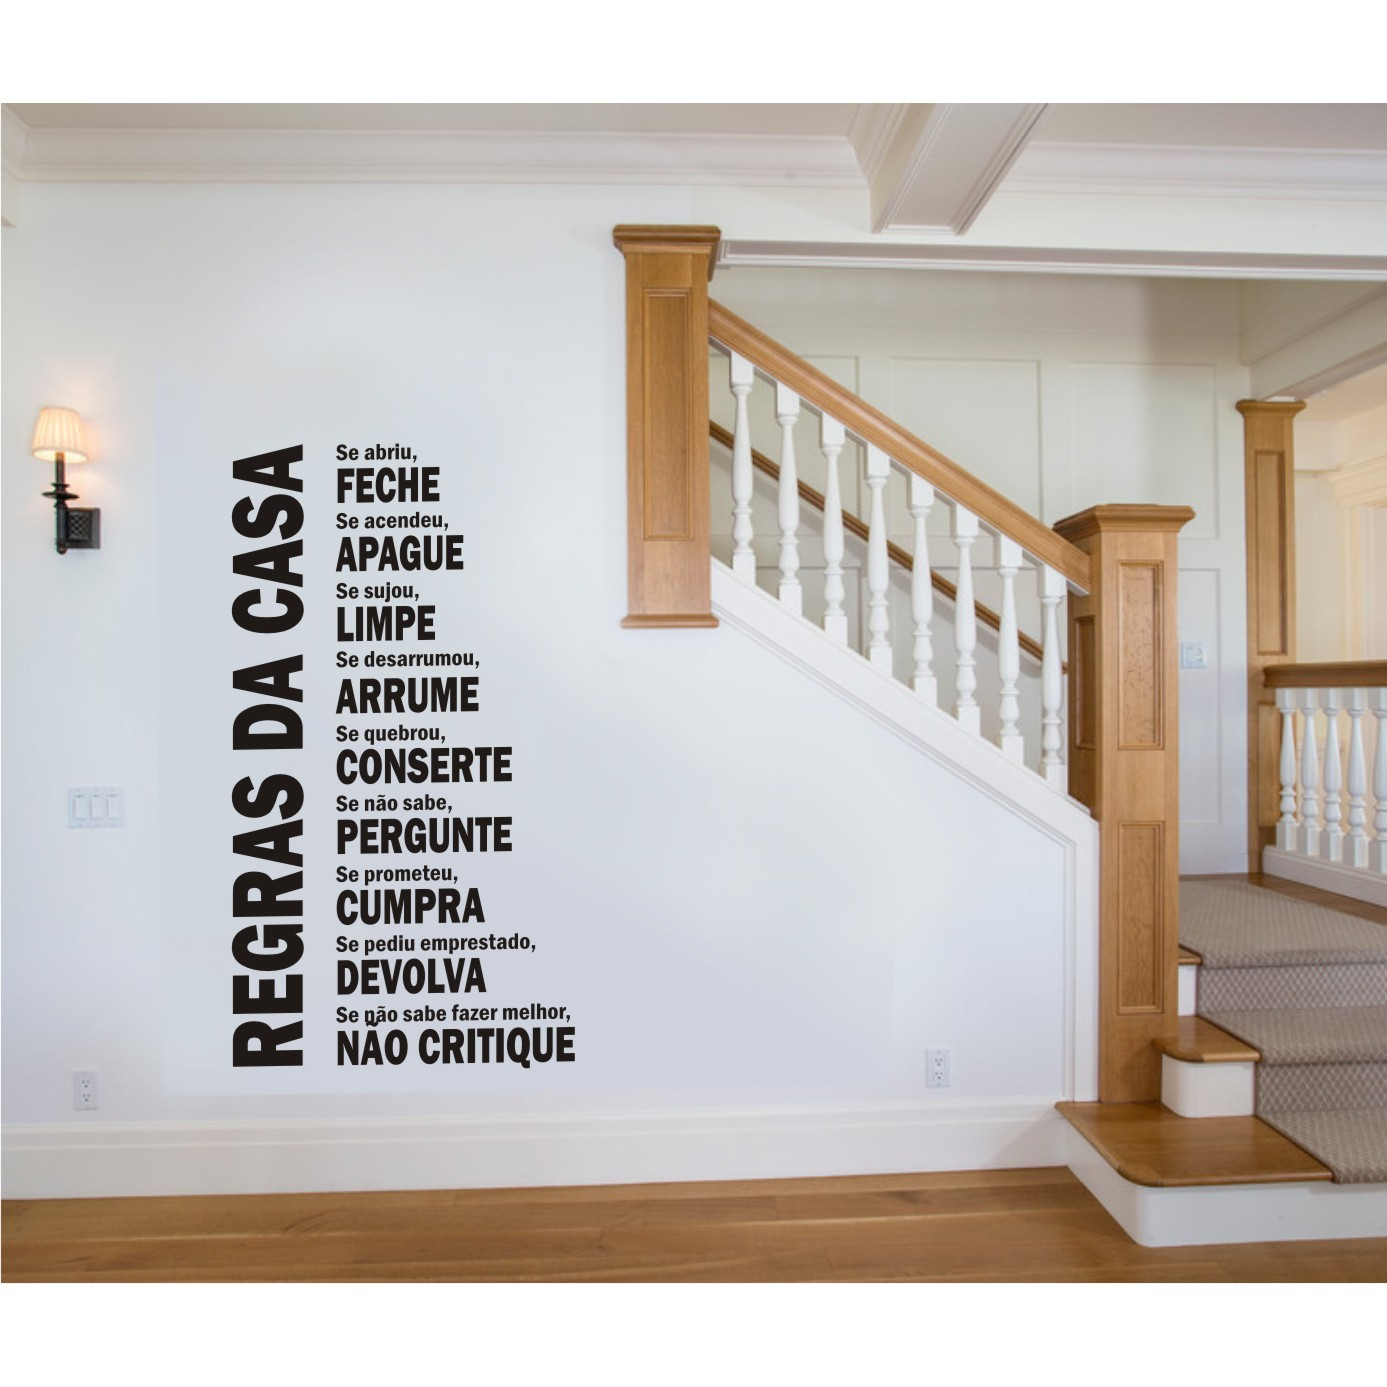 Adesivo Decorativo Parede Regras da Casa